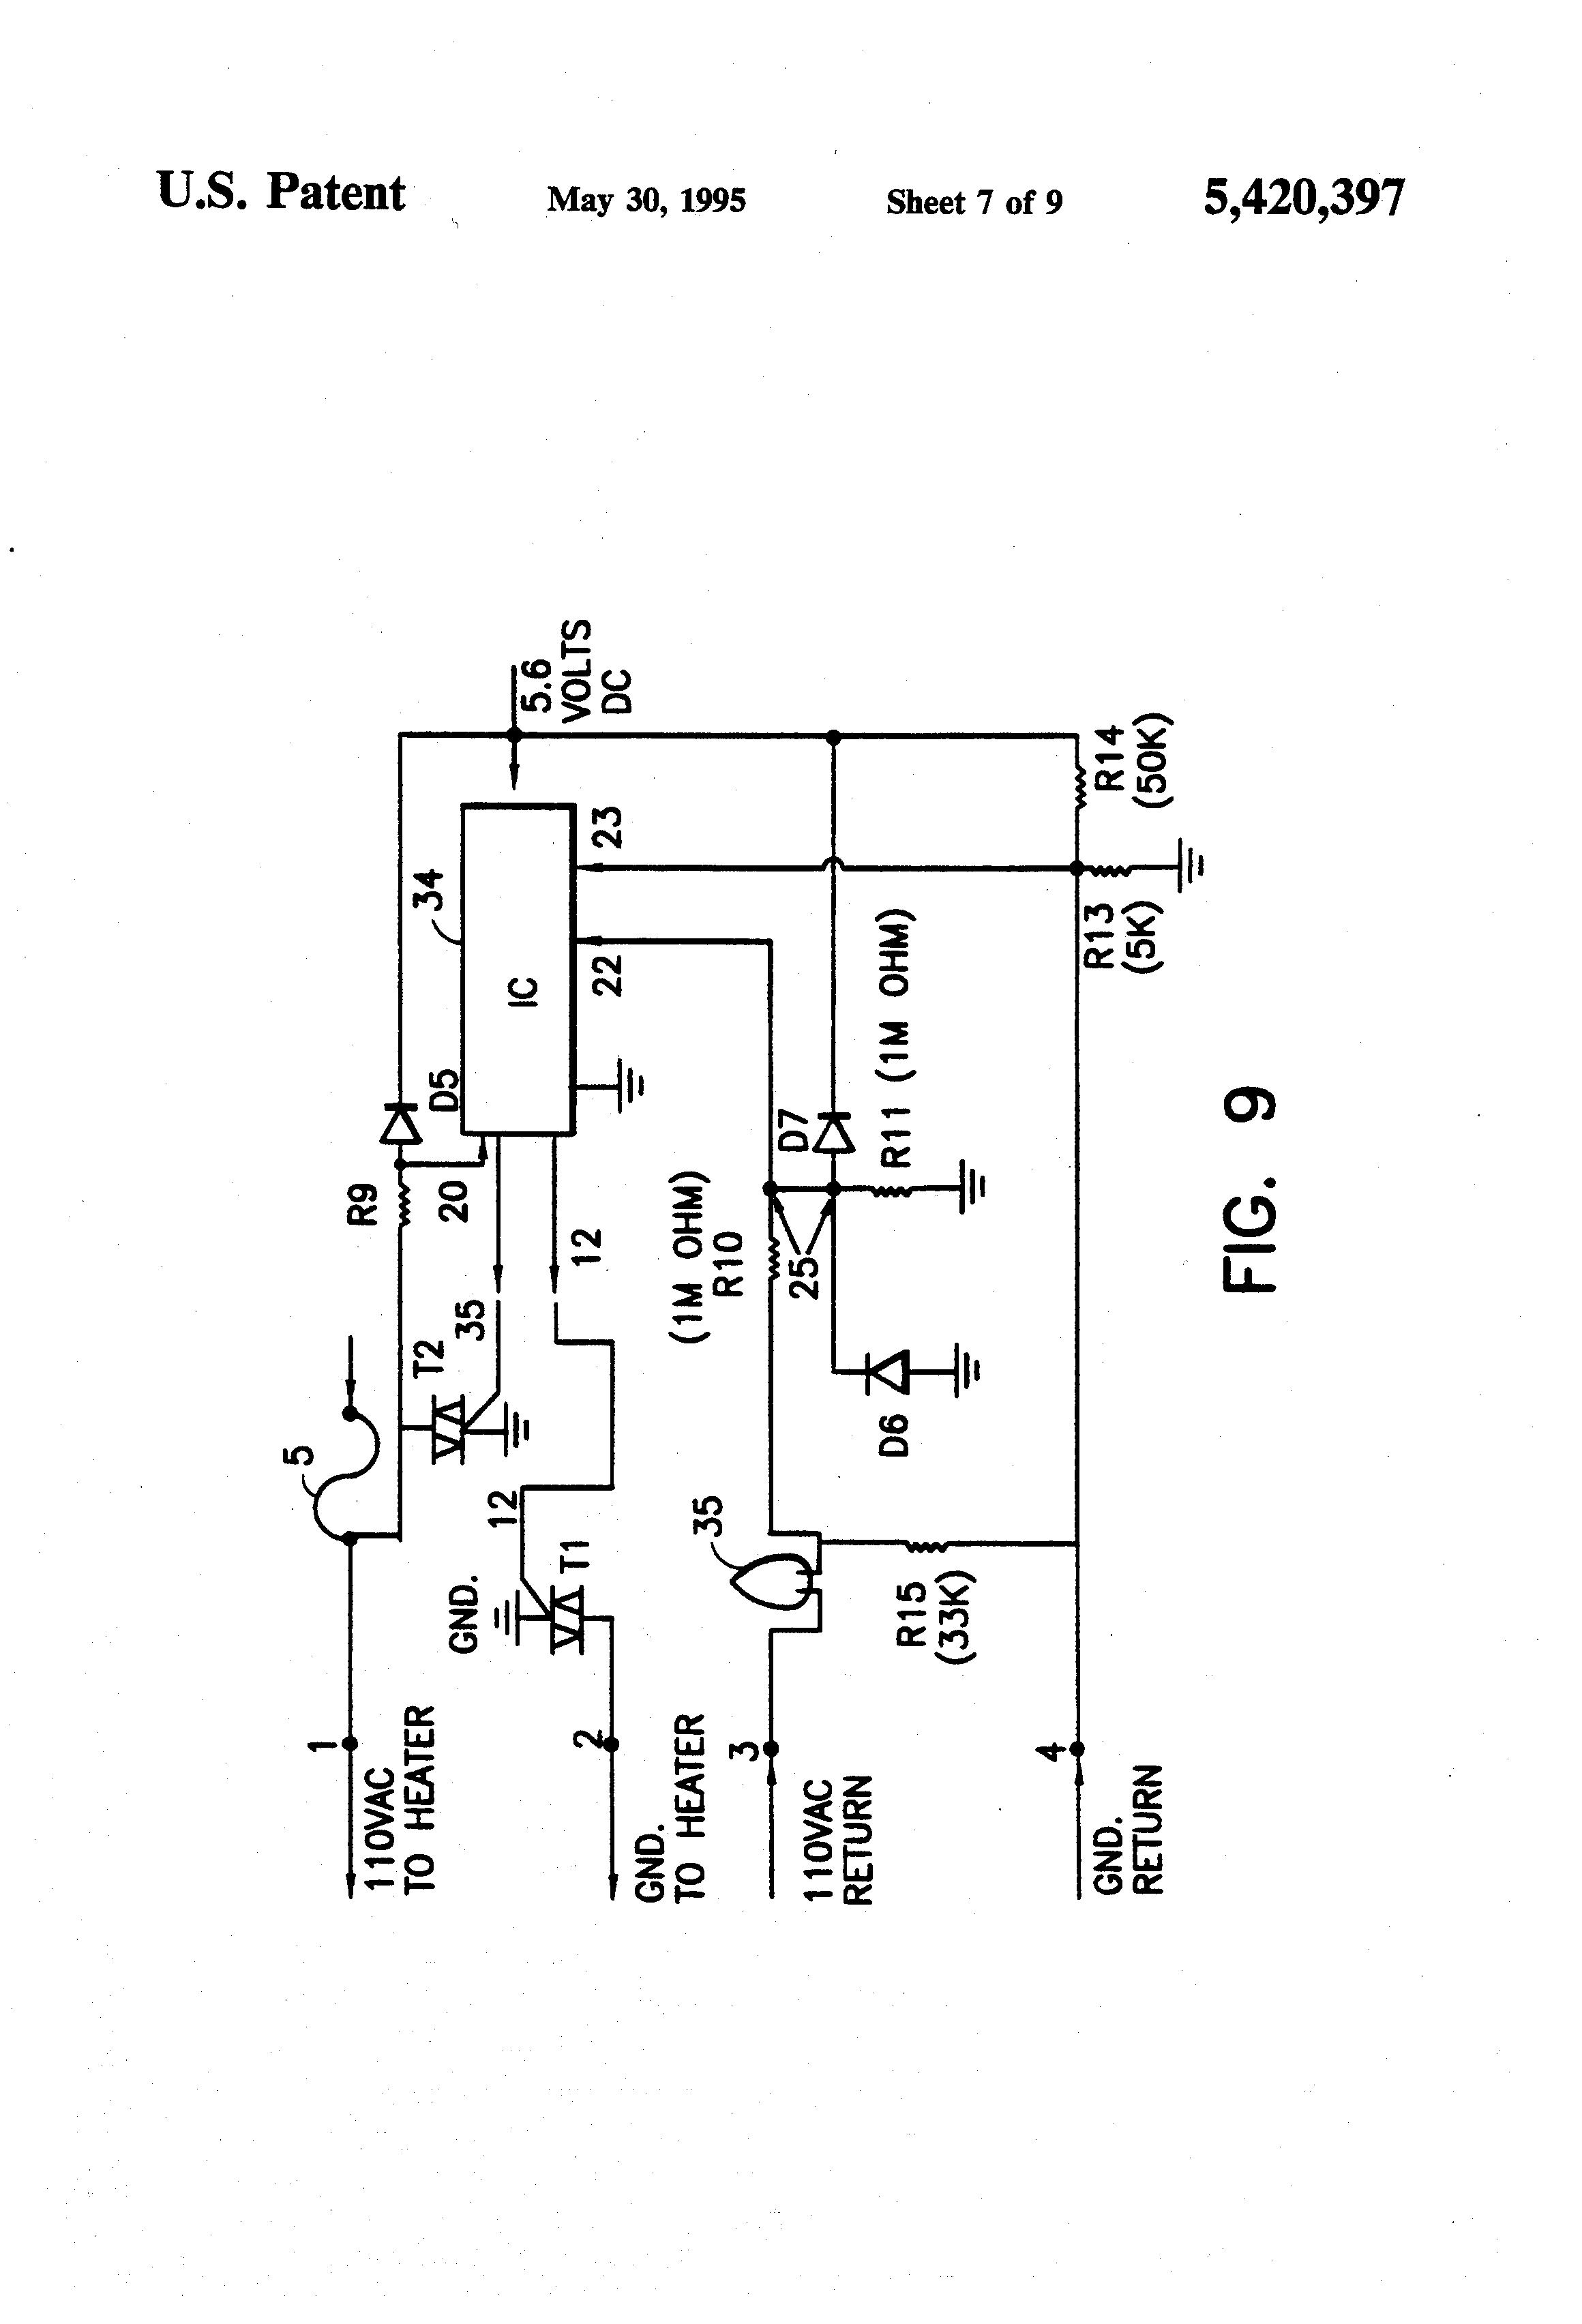 Diagram Sa 7706 Wiring Diagram For Electric Blanket Download Diagram